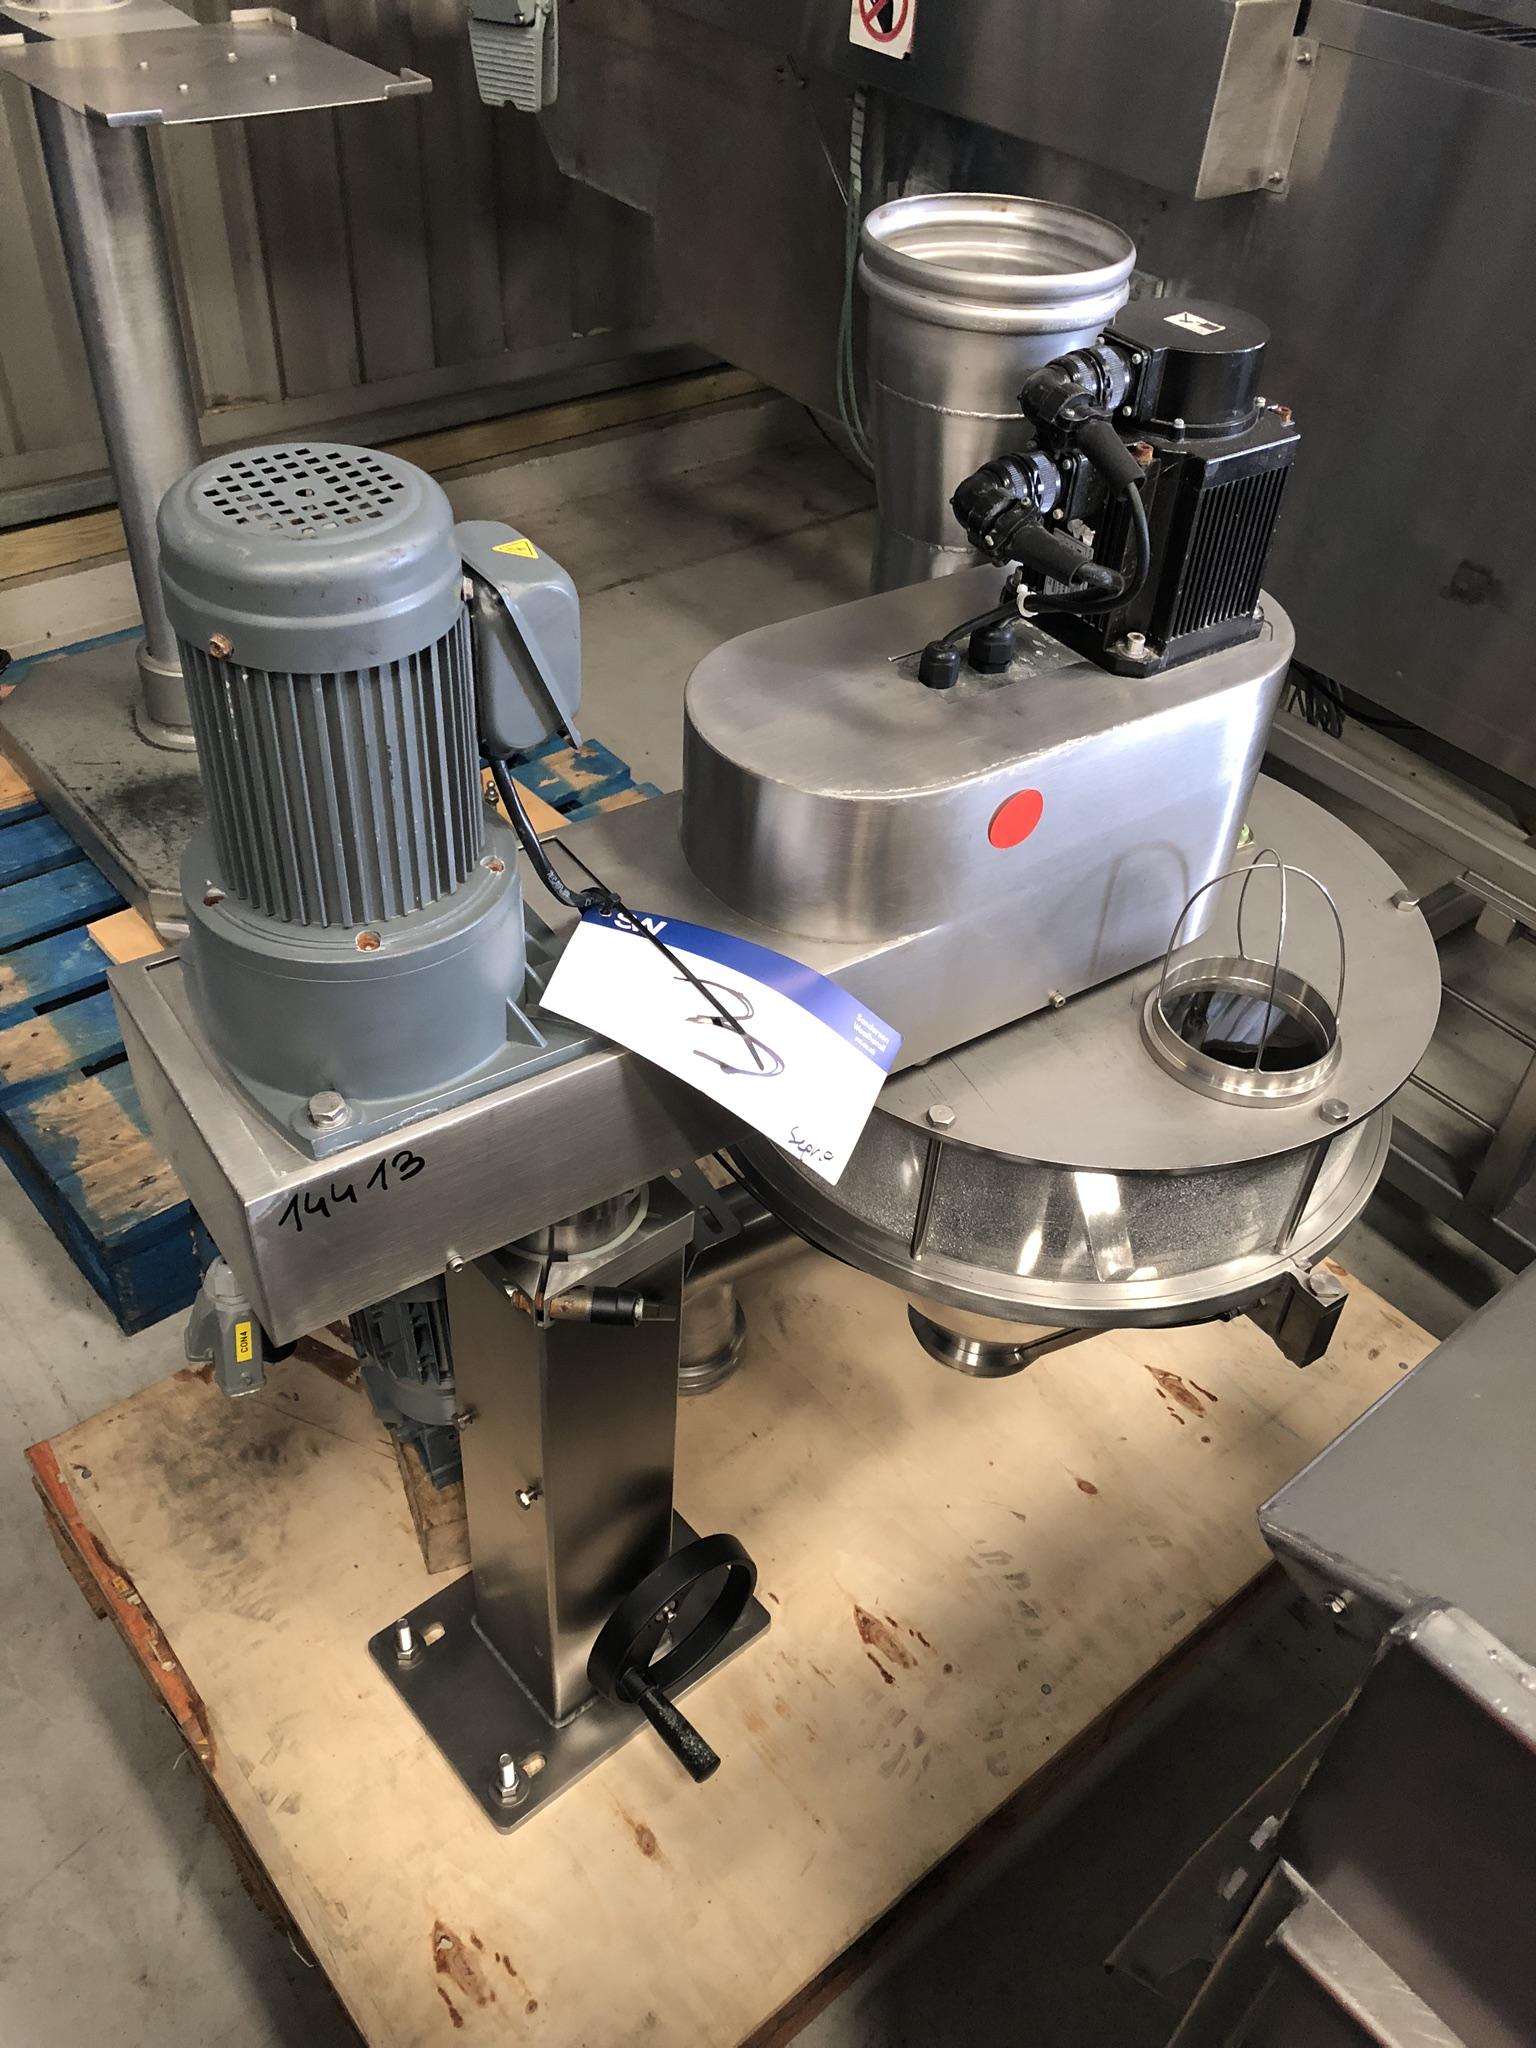 Guttridge PUMP, machine no. 591360-1-1, year of manufacture 2015, with agitator, approx. 1.2m x 1m x